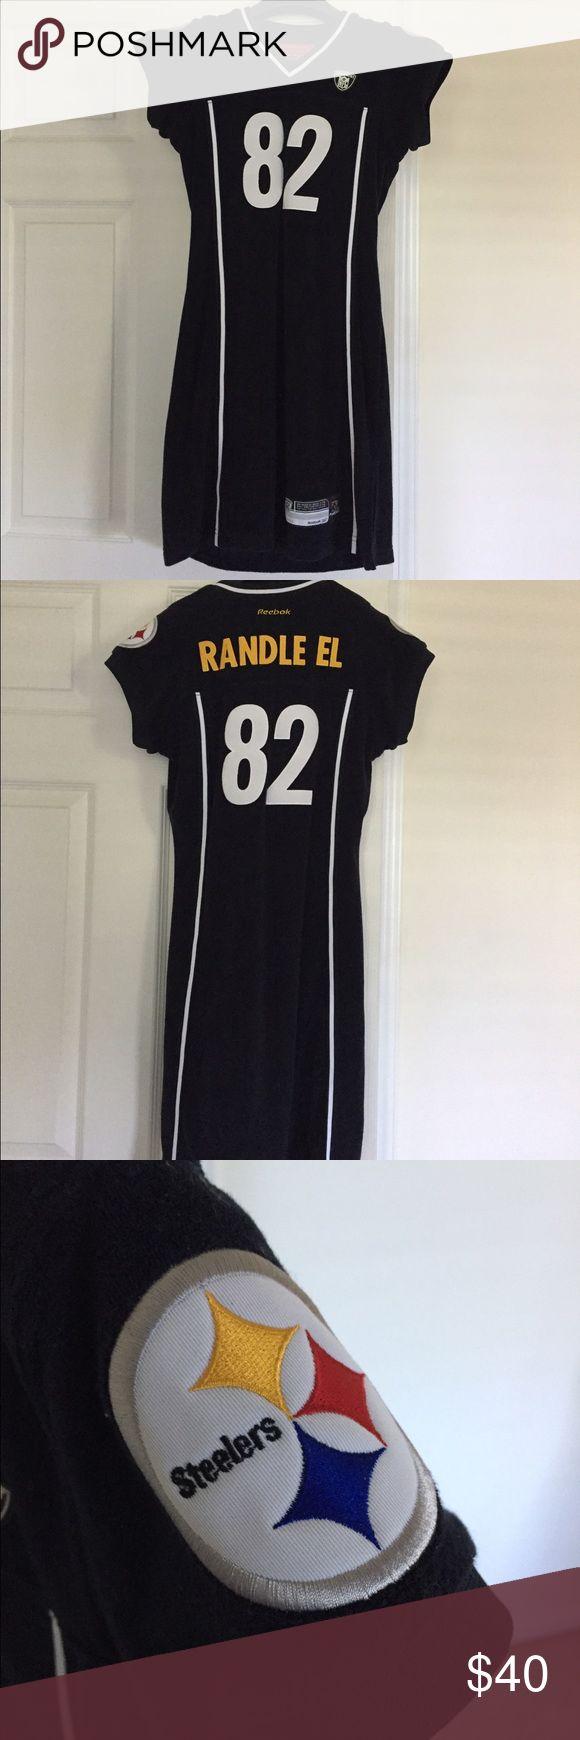 Pittsburgh Steelers jersey dress Official Reebok Antwaan Randle El jersey dress . Small Reebok Dresses